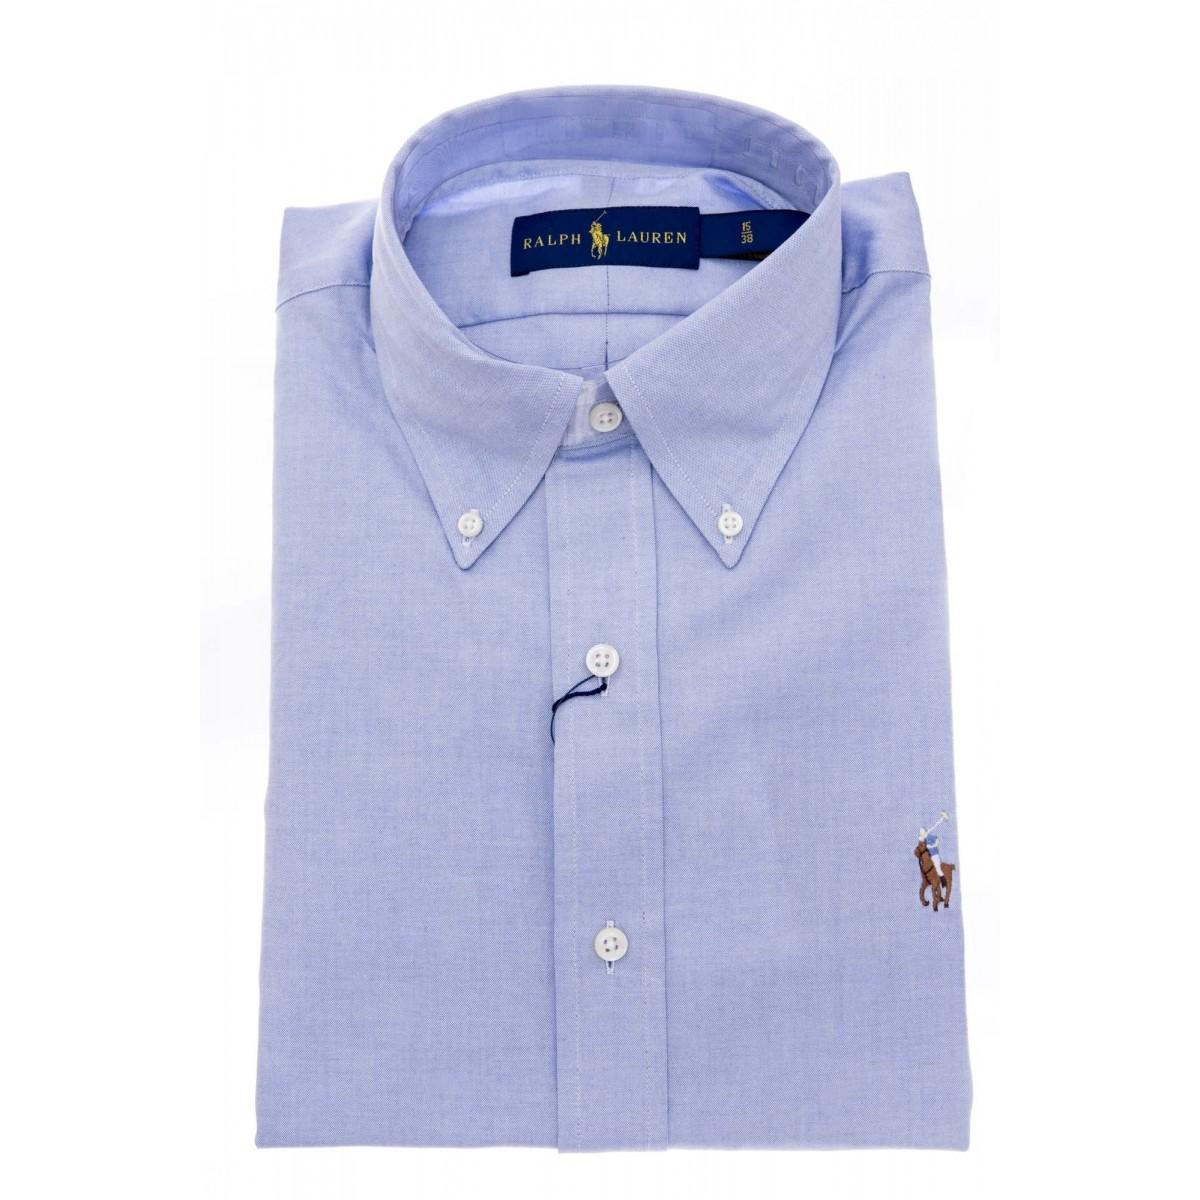 Camicia uomo Ralph lauren - A02w3cbpc0040 pin point